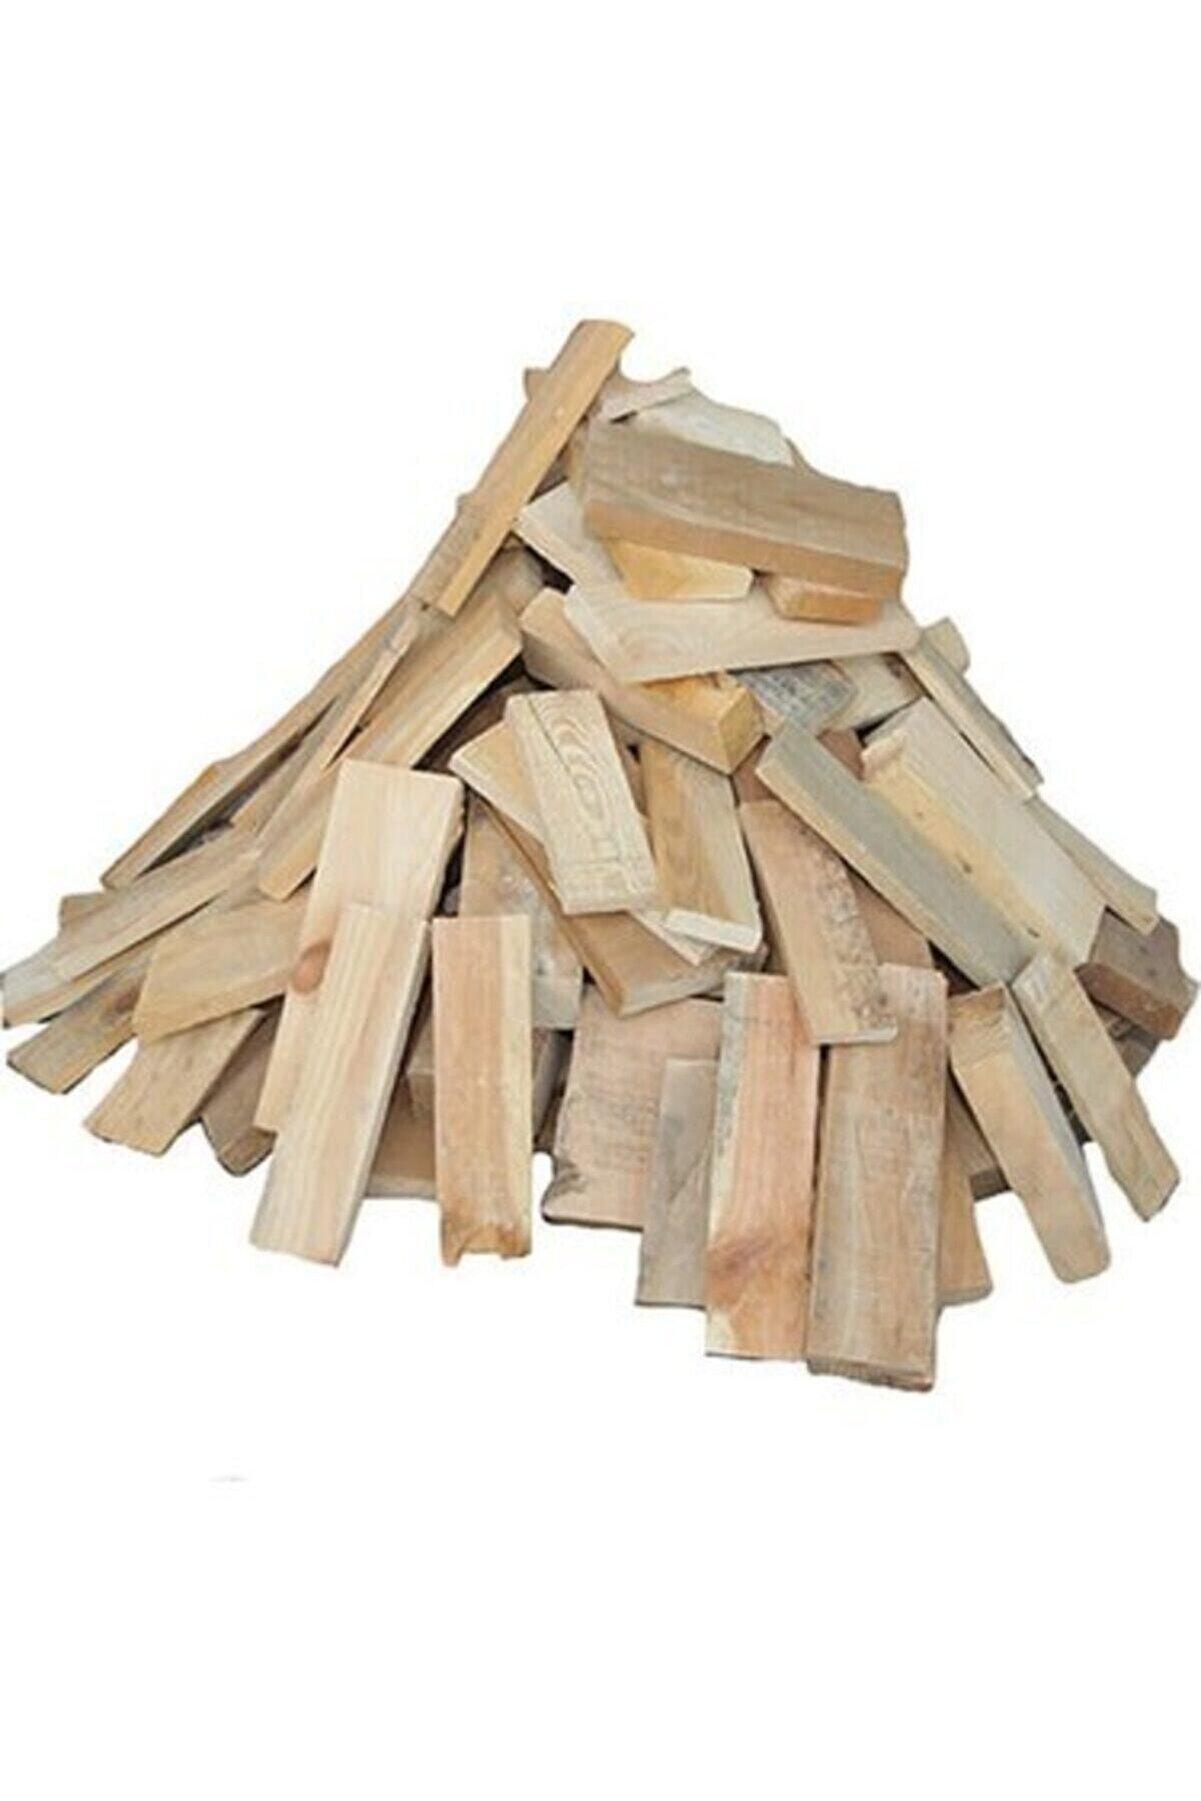 Narimba Parça Hazır Kuru Odun Semaver Mangal Soba 5 Kg +çıra Hediyeli